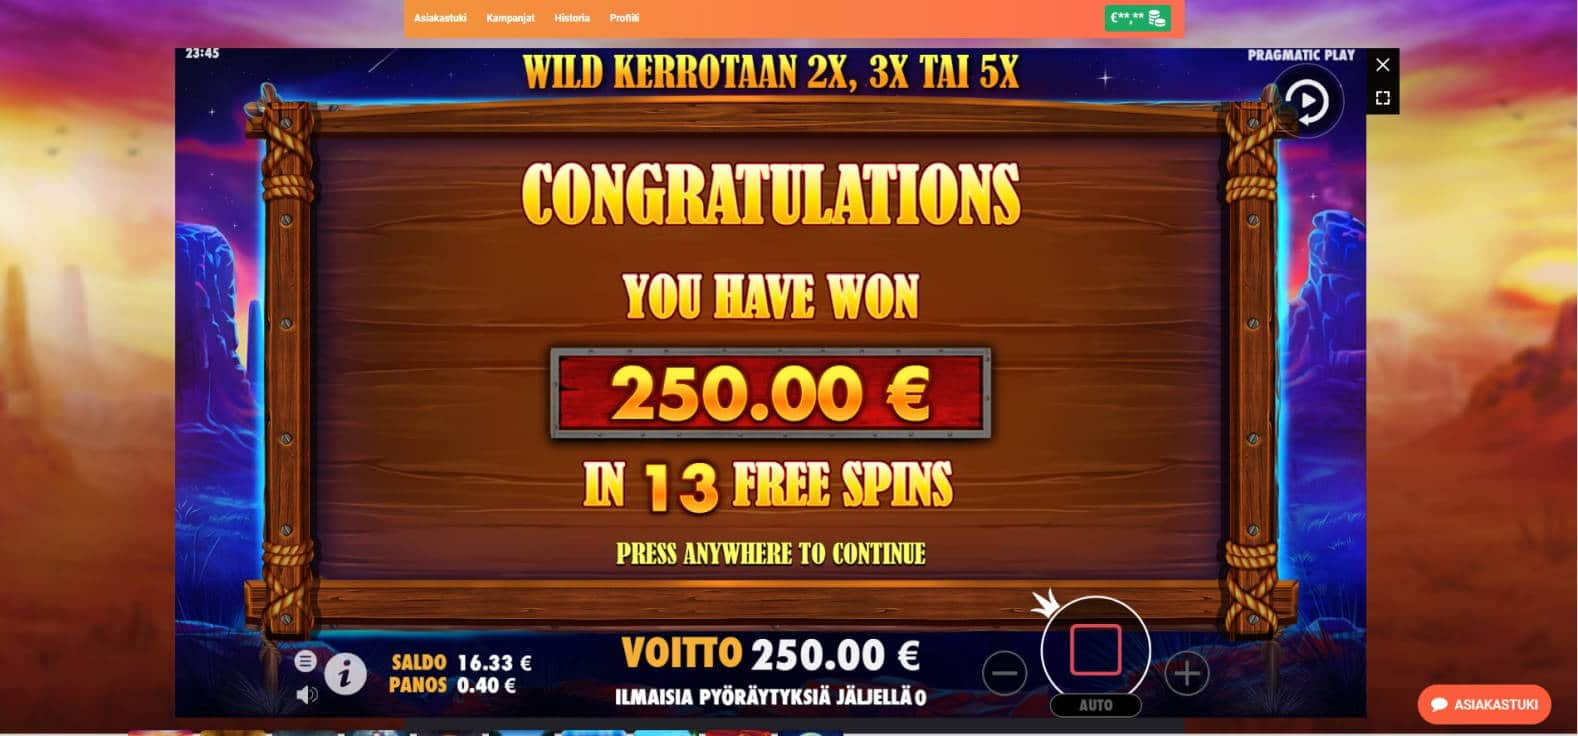 Buffalo King Casino win picture by Henkka 30.8.2021 250e 625X LeoVegas